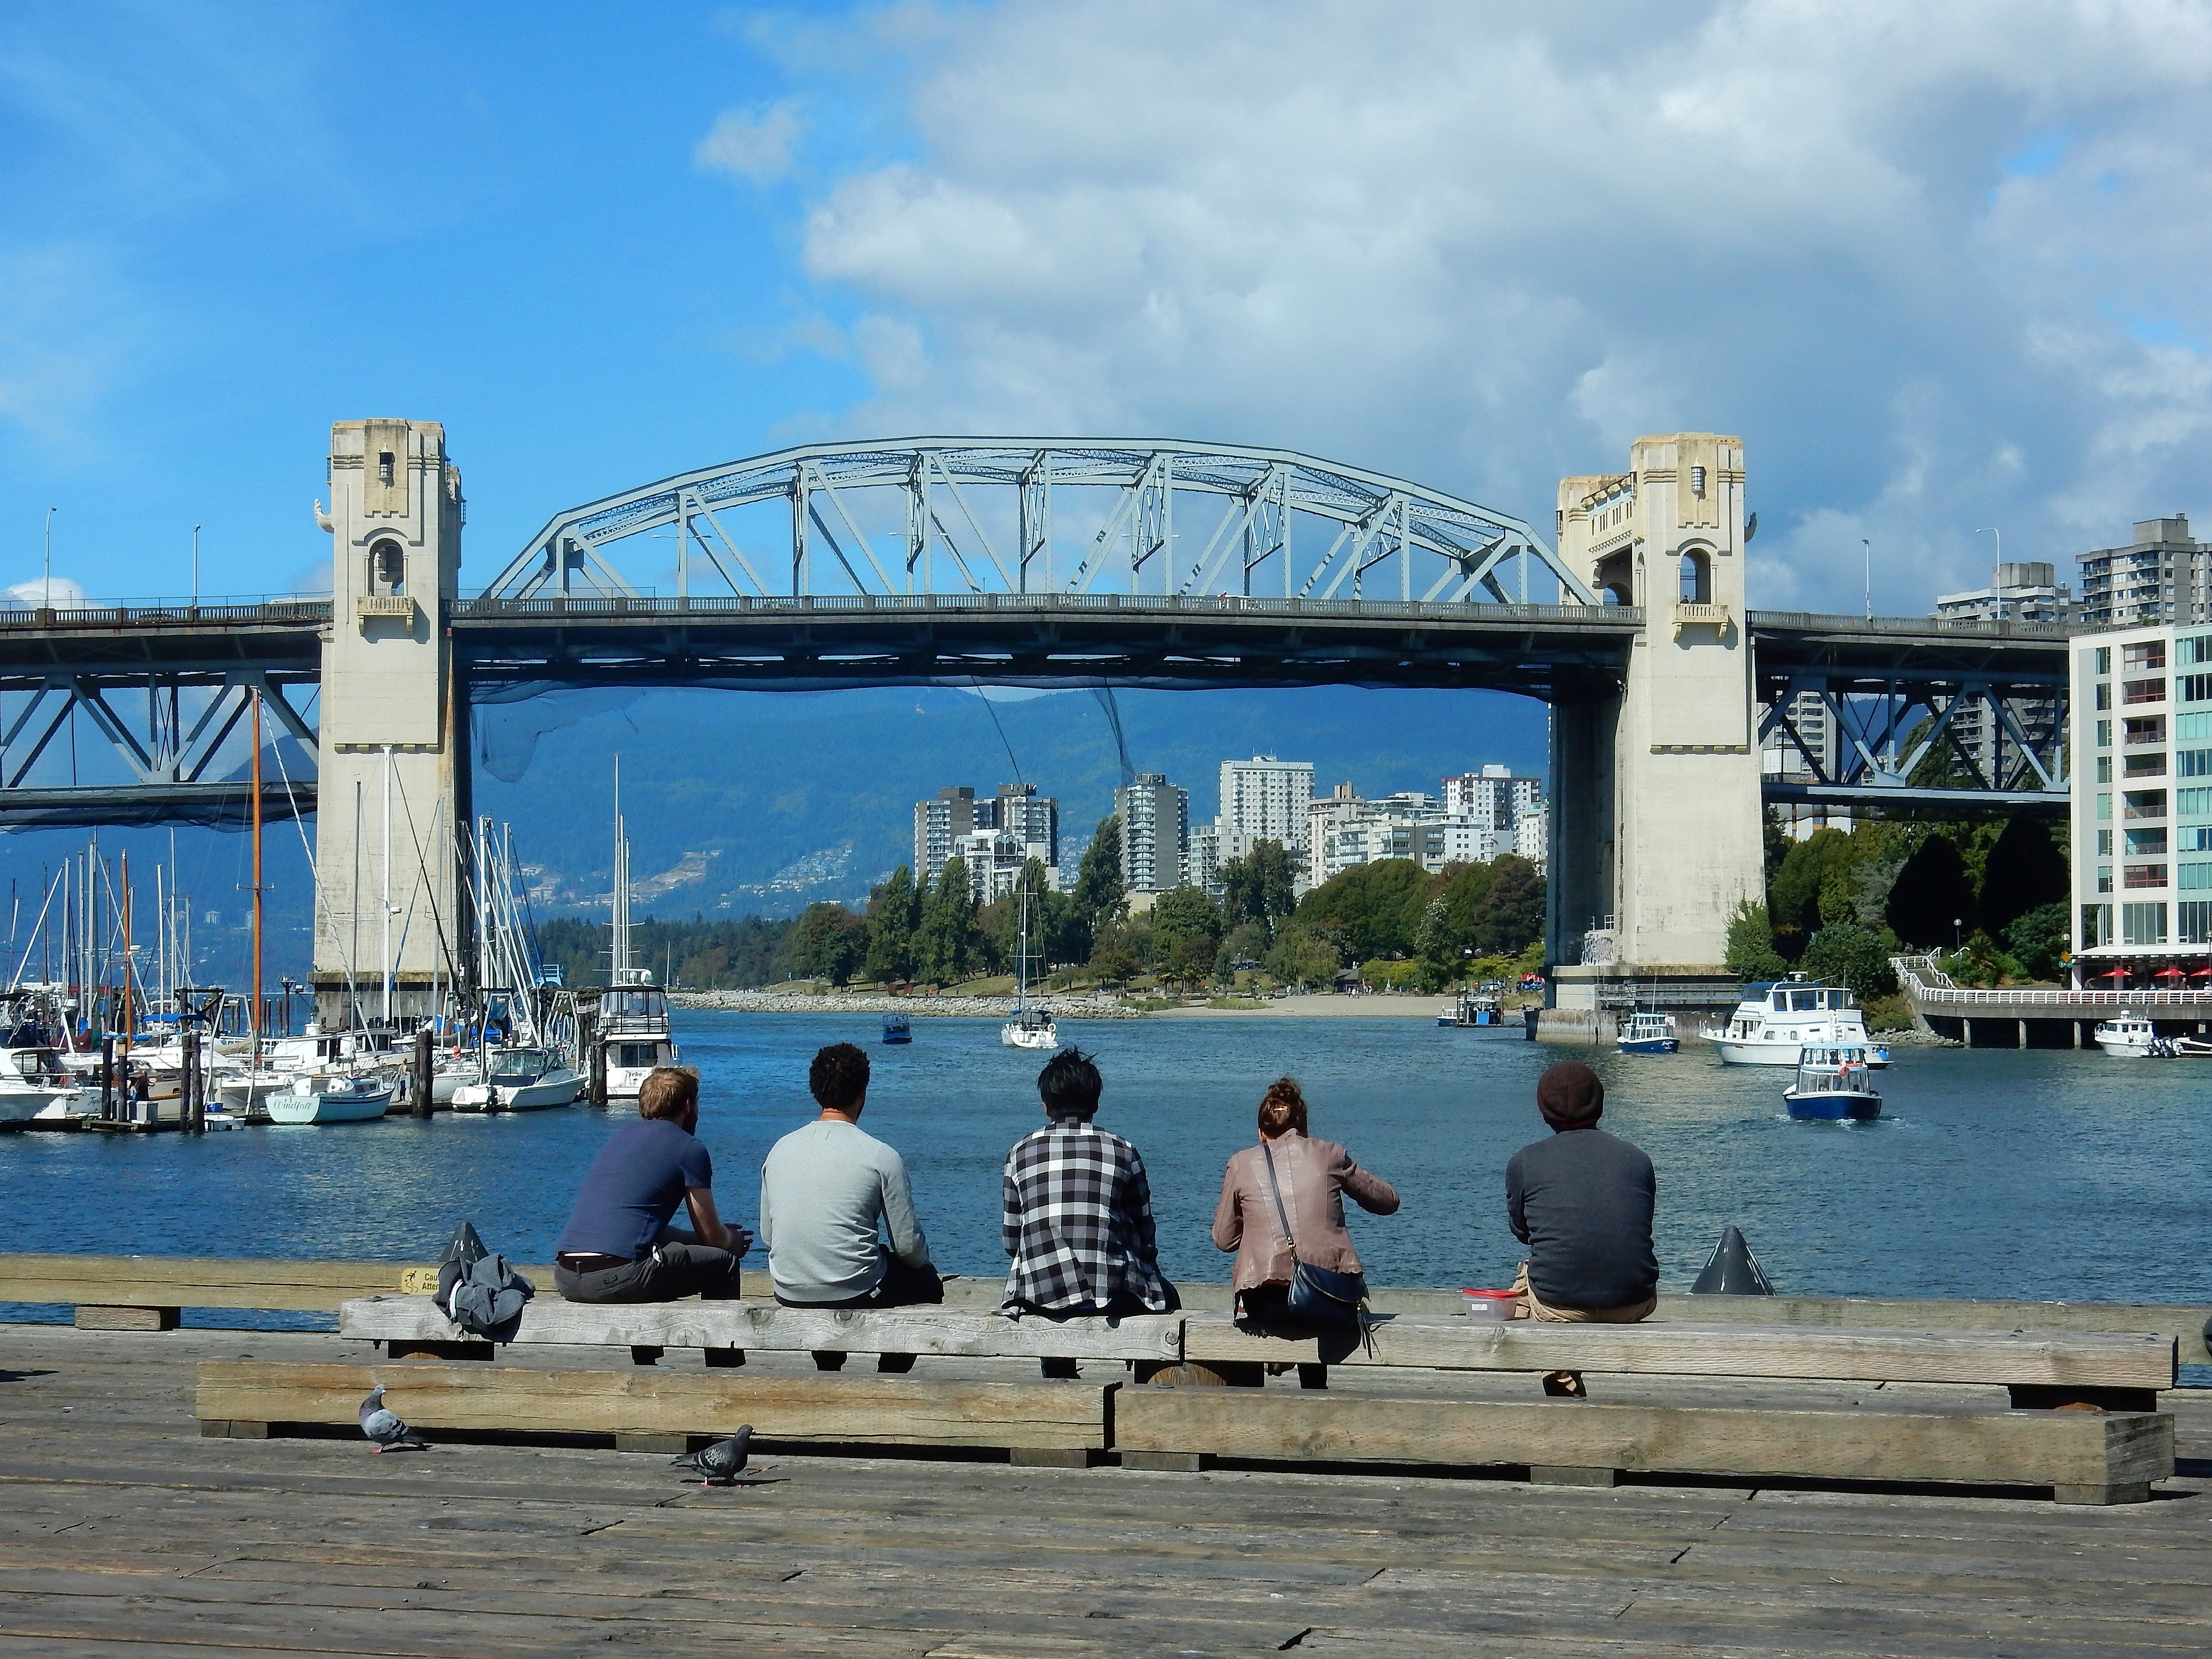 Tourists at harbor photo